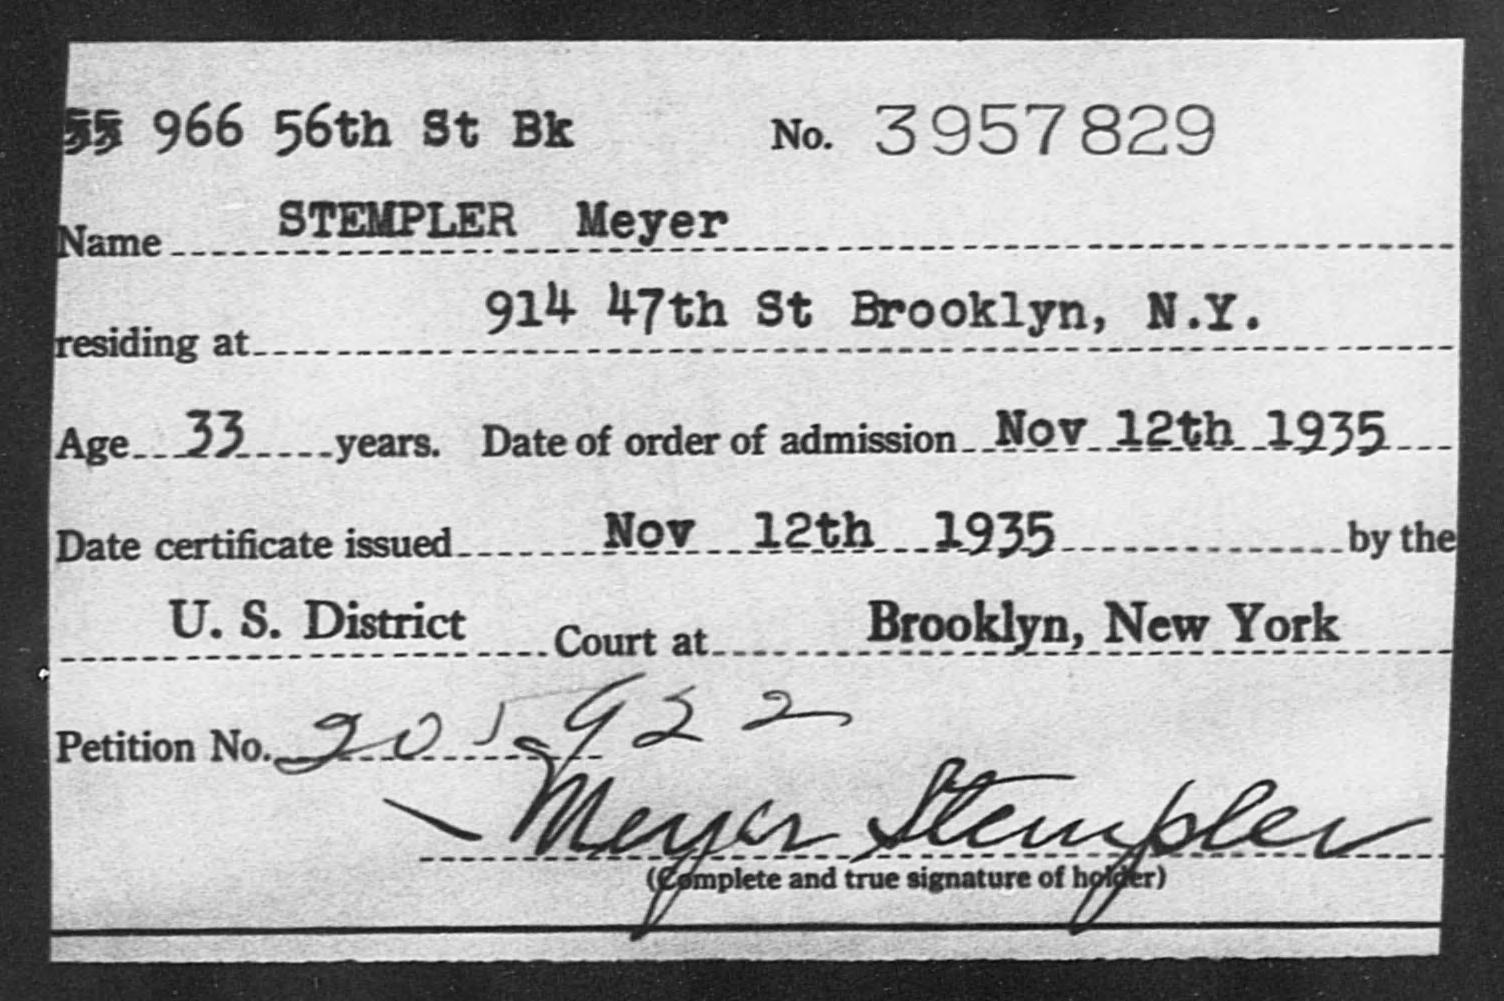 STEMPLER Meyer - Born: [BLANK], Naturalized: 1935